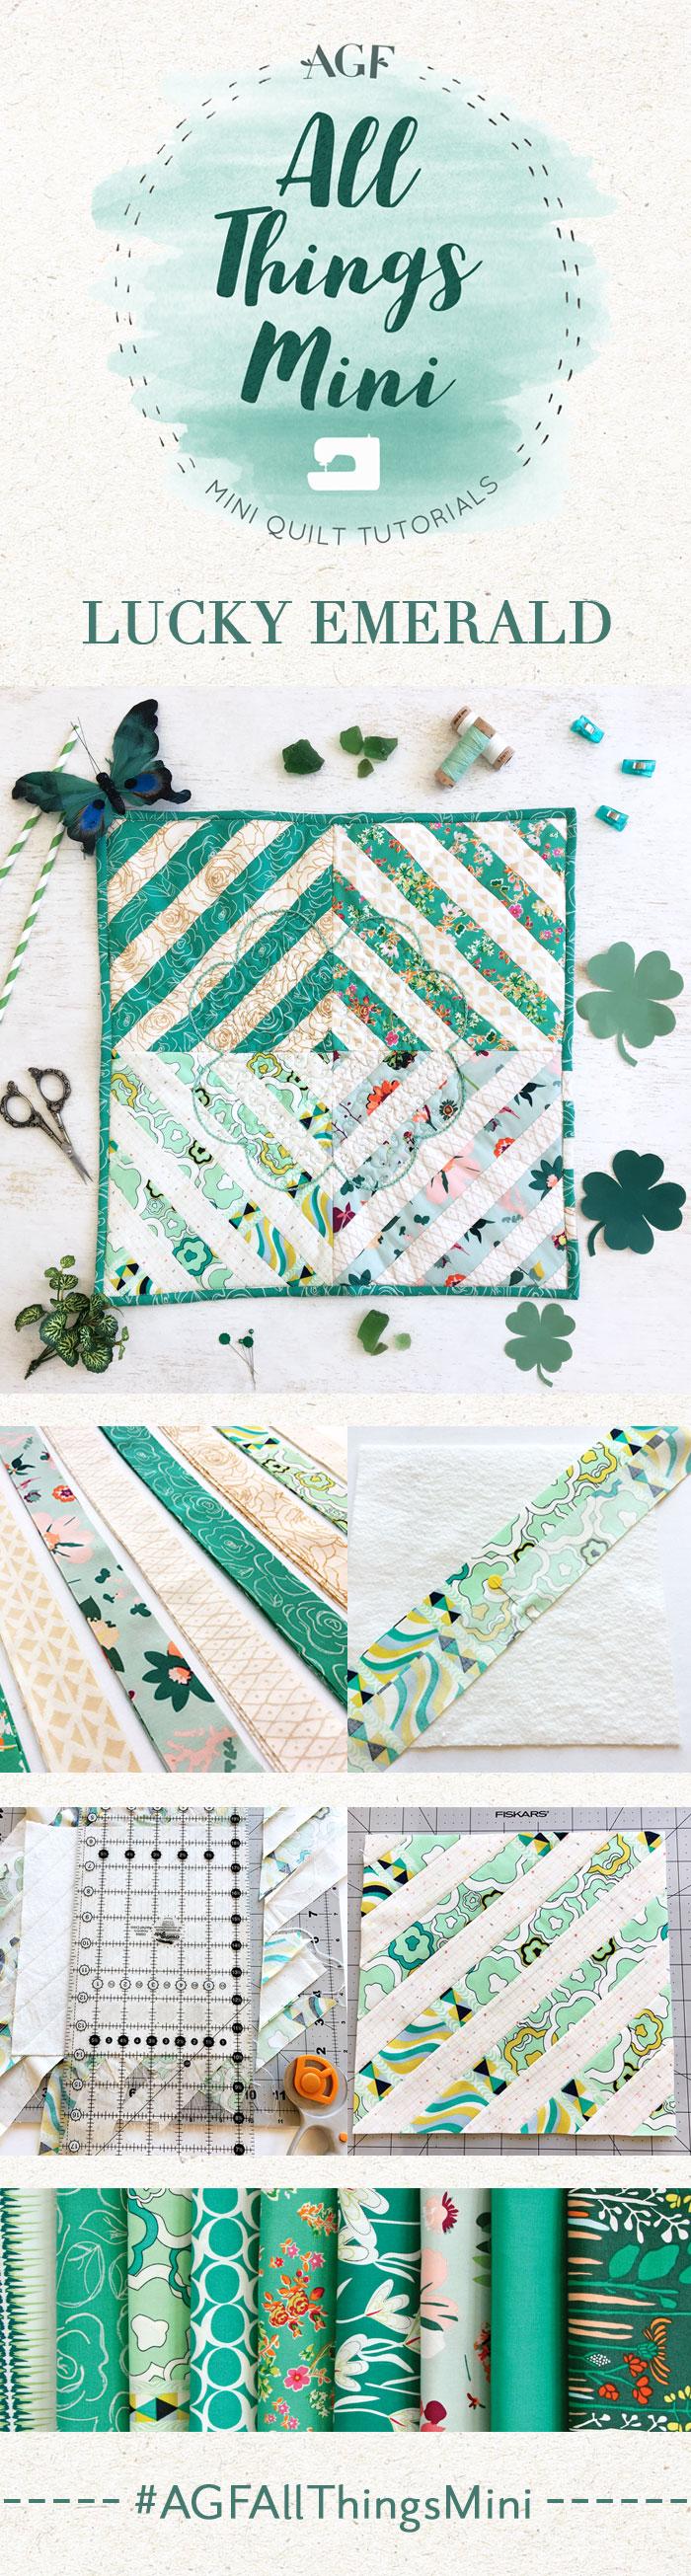 St-Patrick's-Day-Mini--Graphic